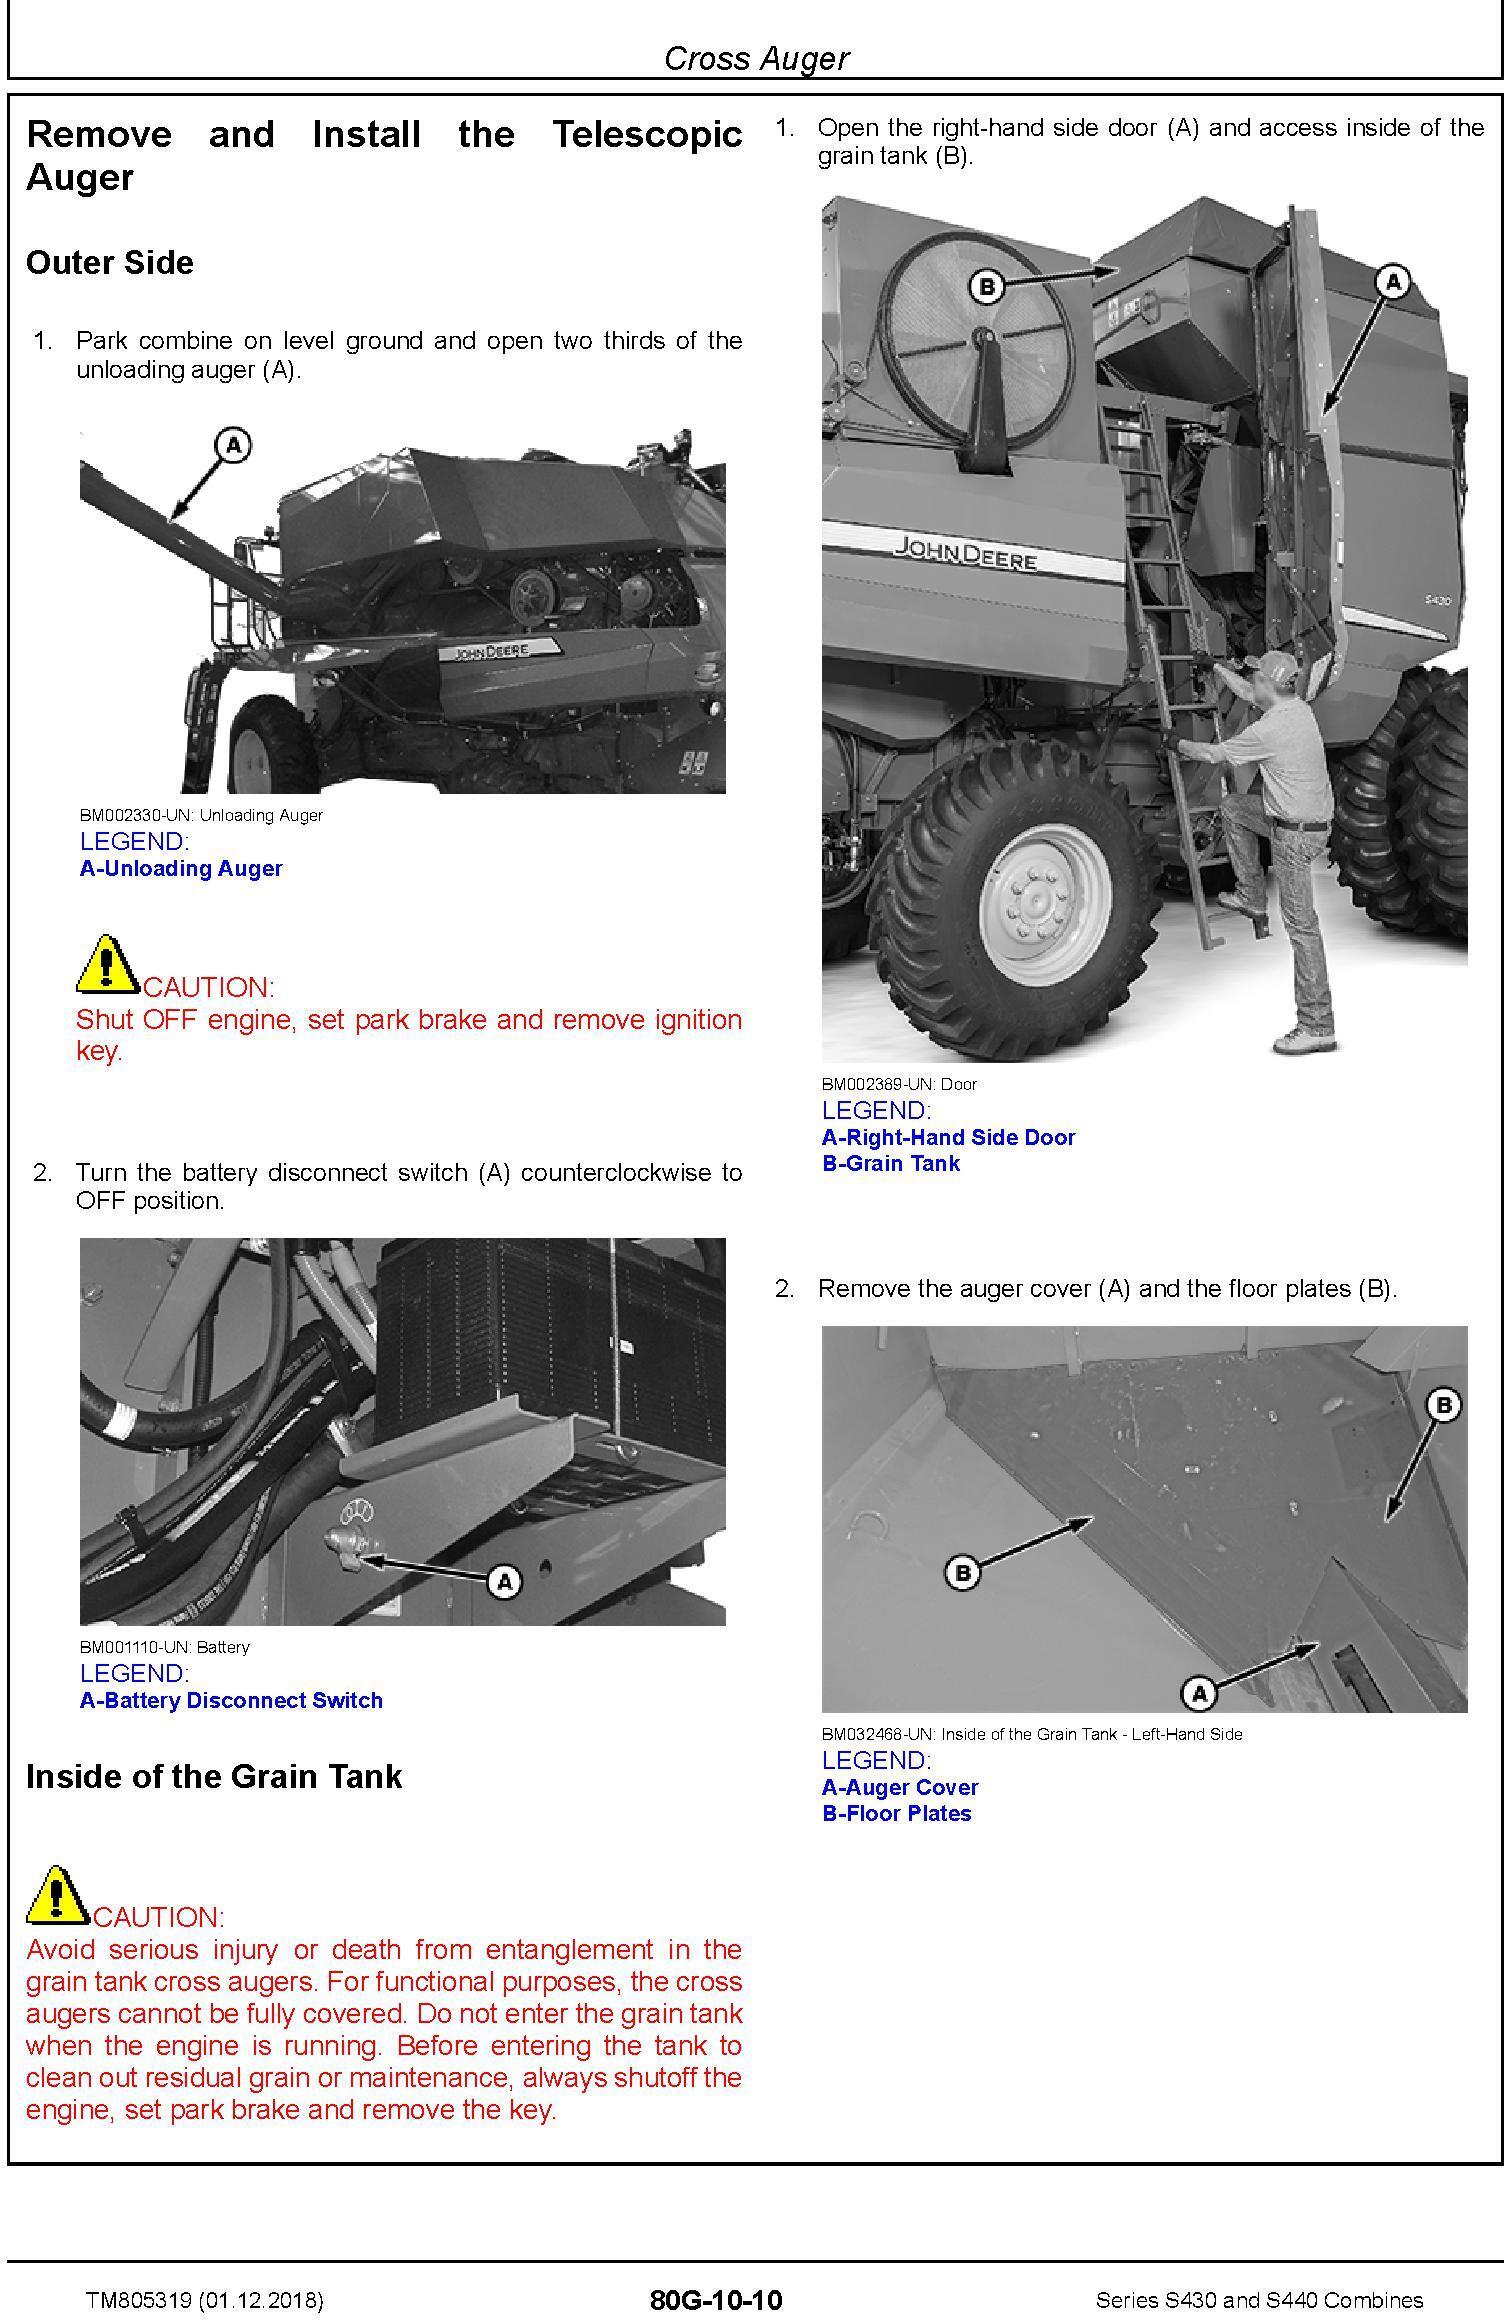 JD John Deere S430 and S440 Combines Repair Technical Service Manual (TM805319) - 1